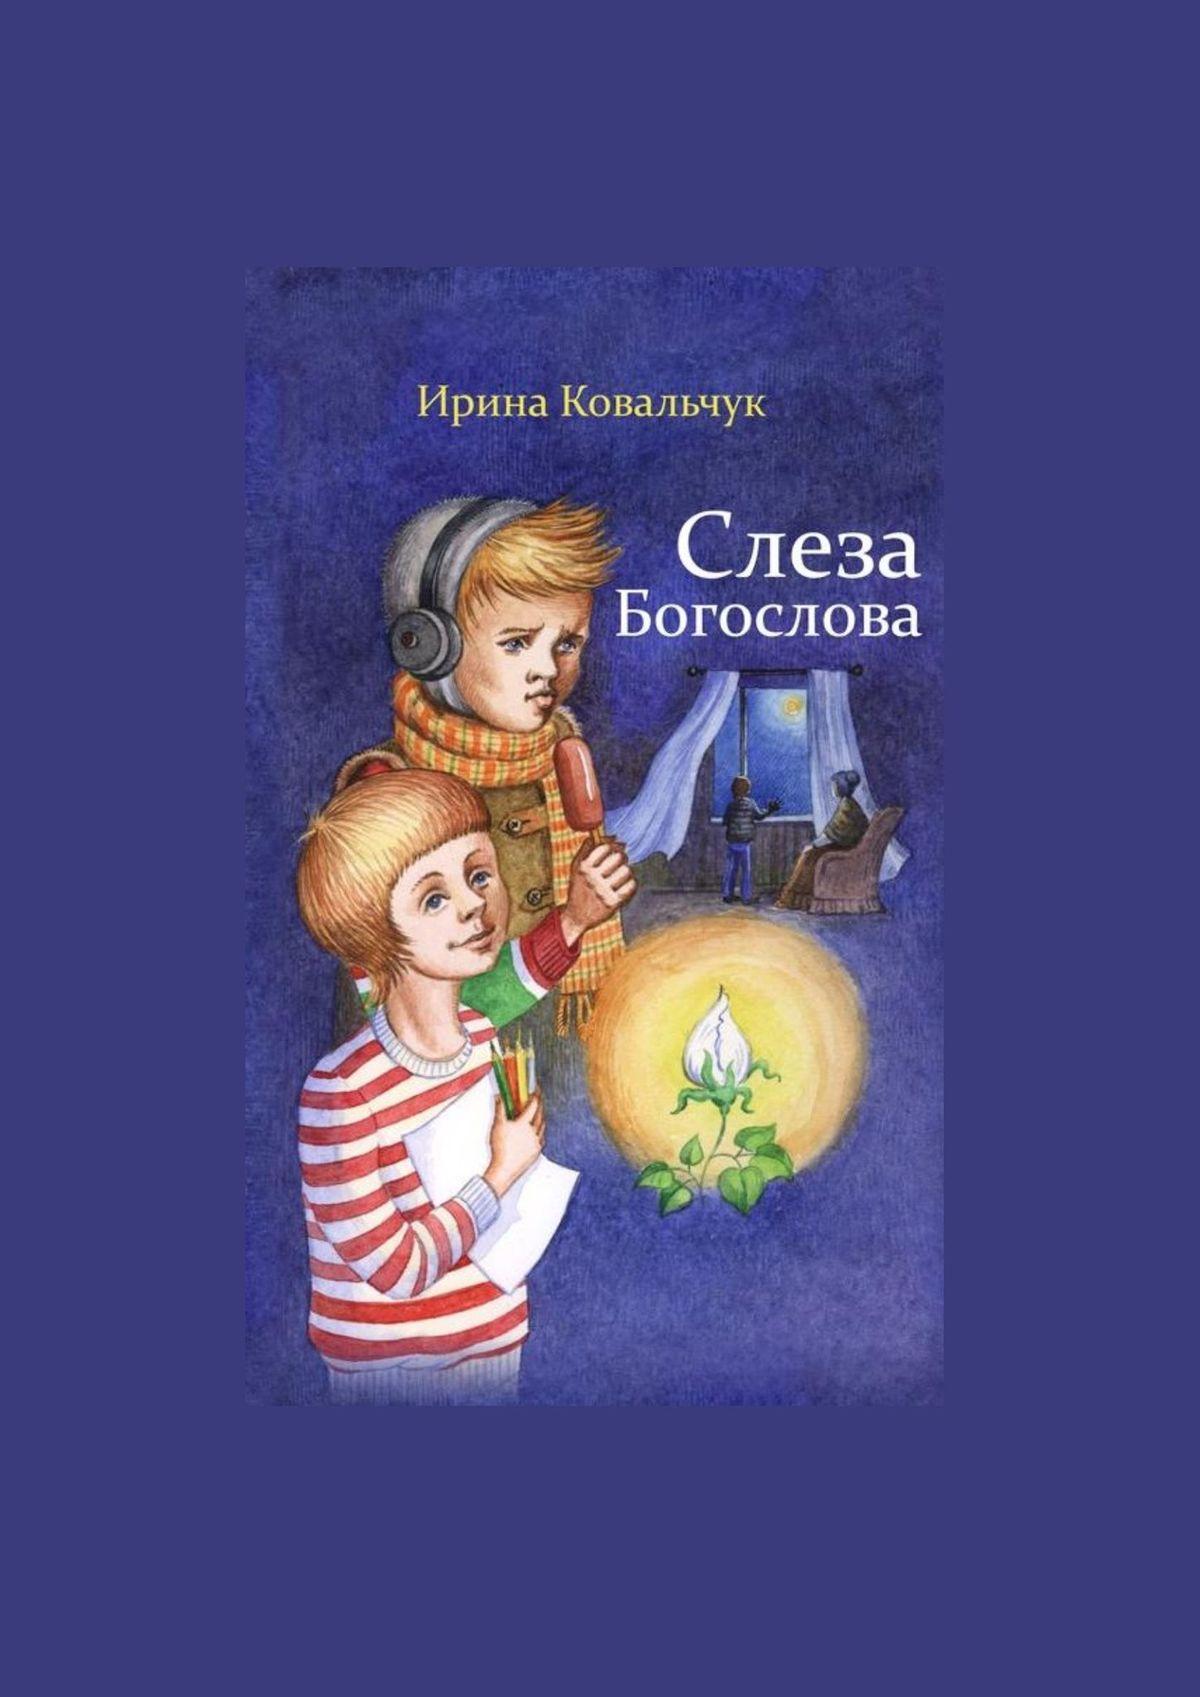 Ирина Ковальчук Слеза Богослова